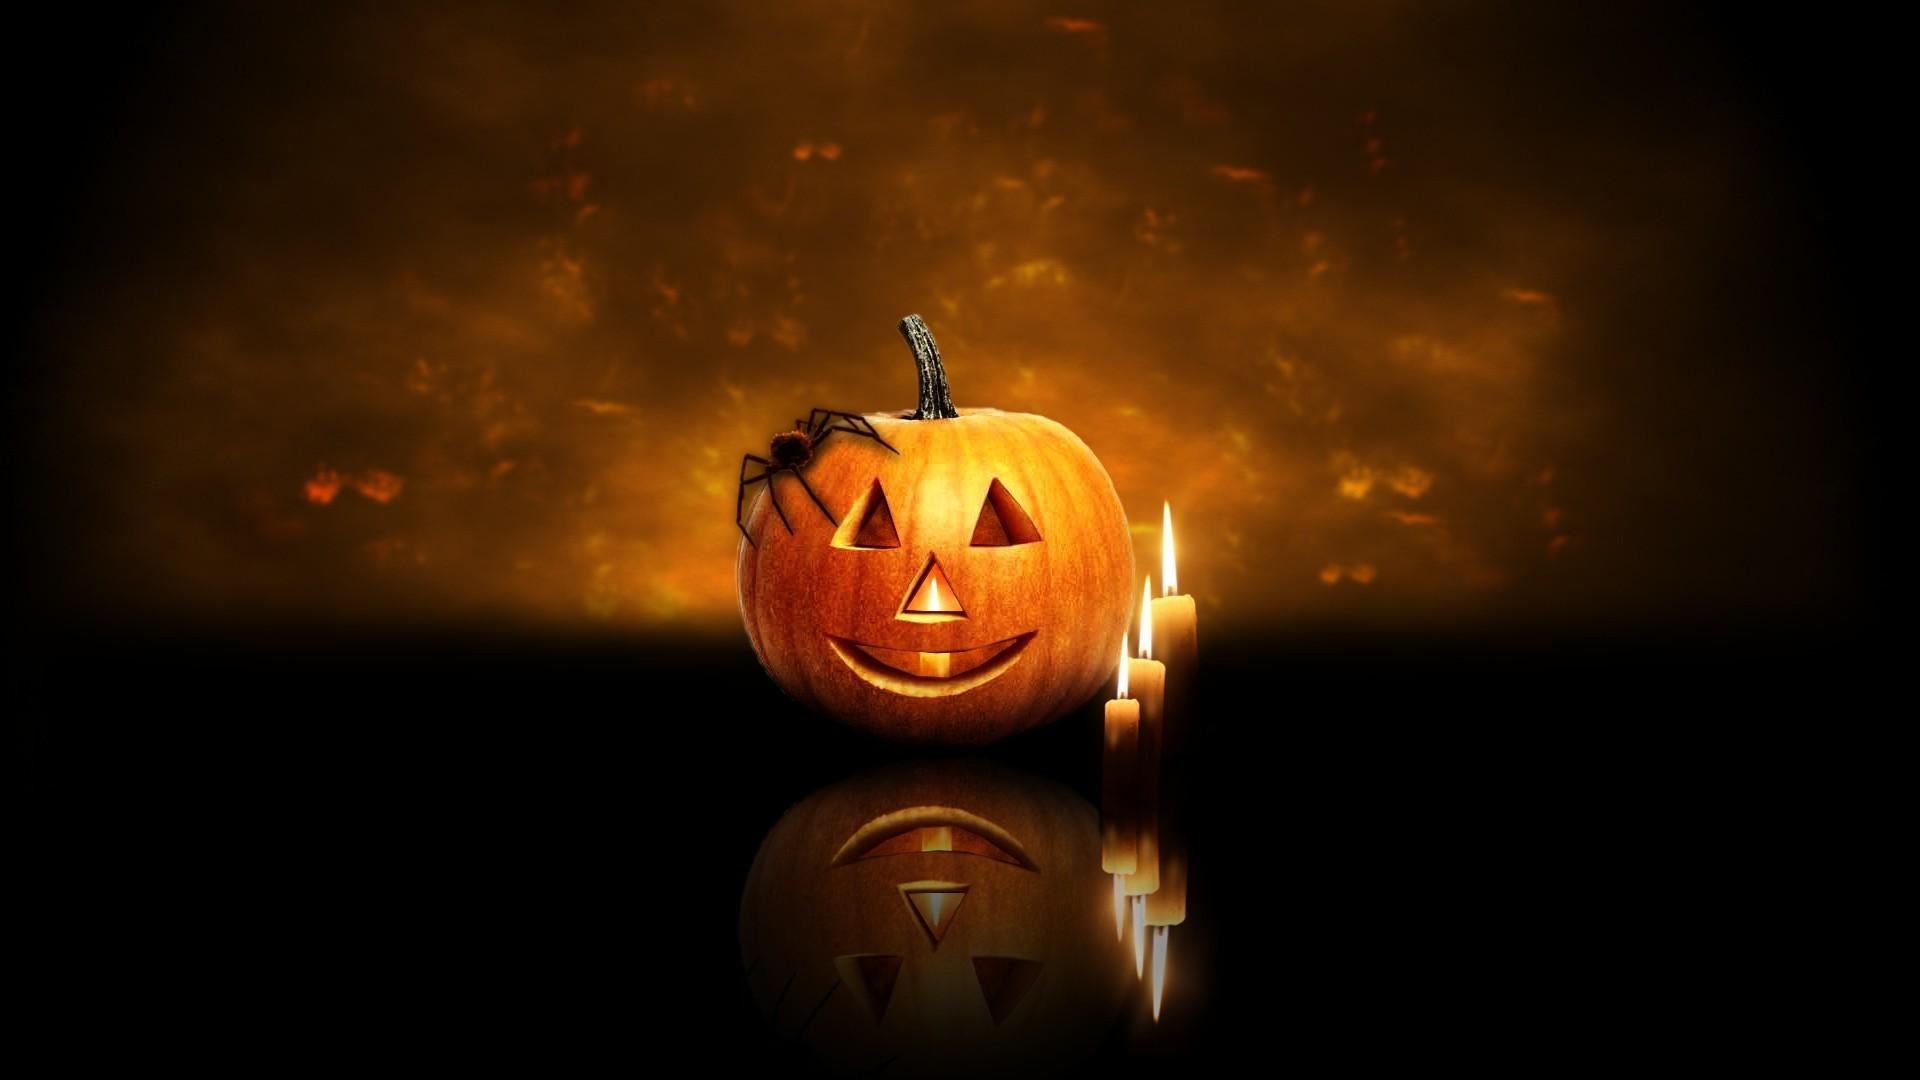 Animated Halloween Wallpaper